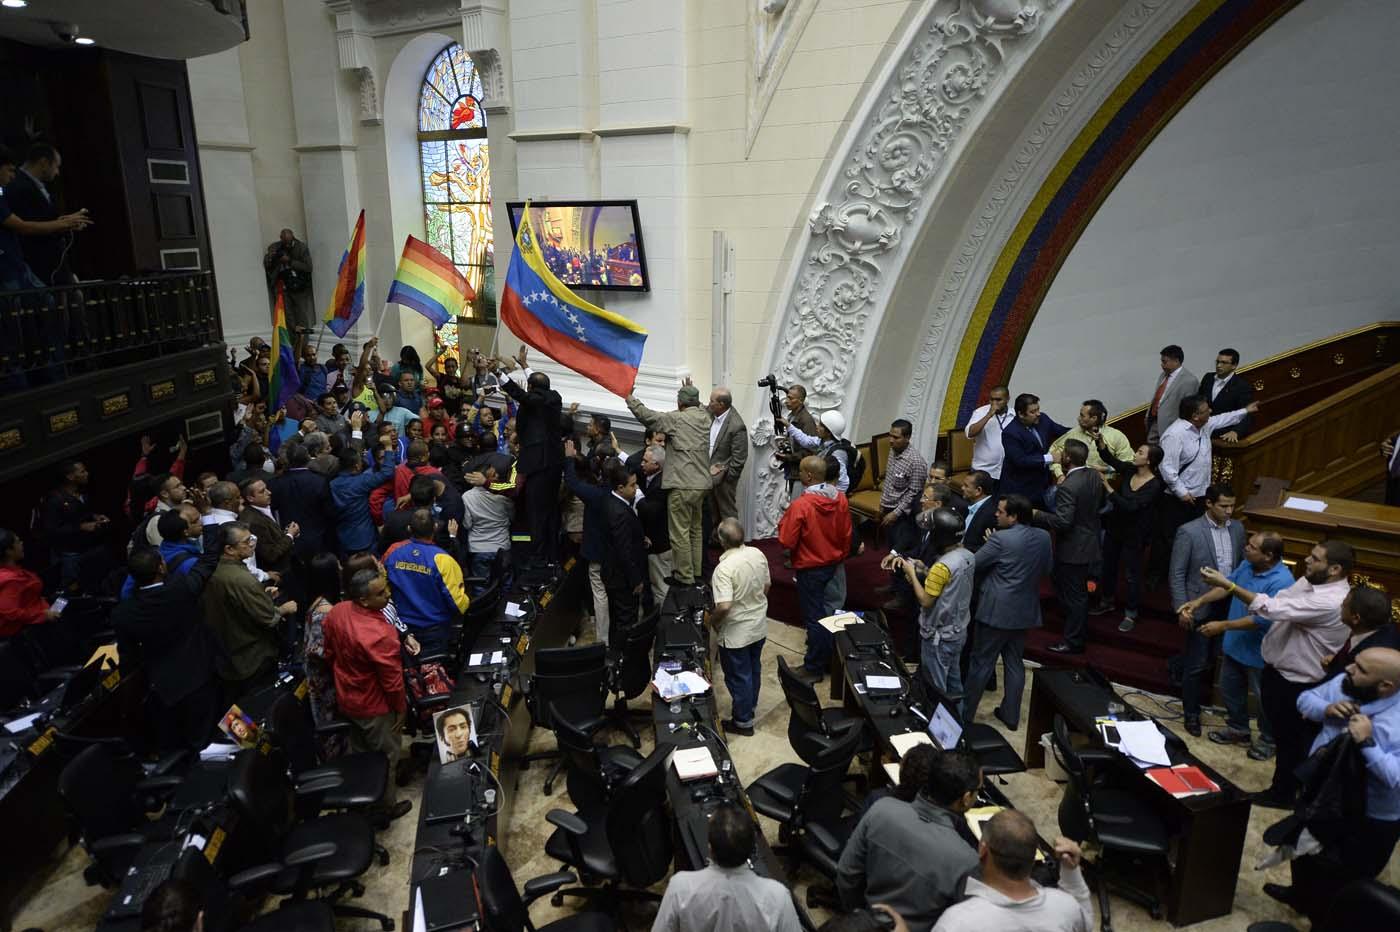 Gobierno de Nicolas Maduro. - Página 18 000_HF3CC